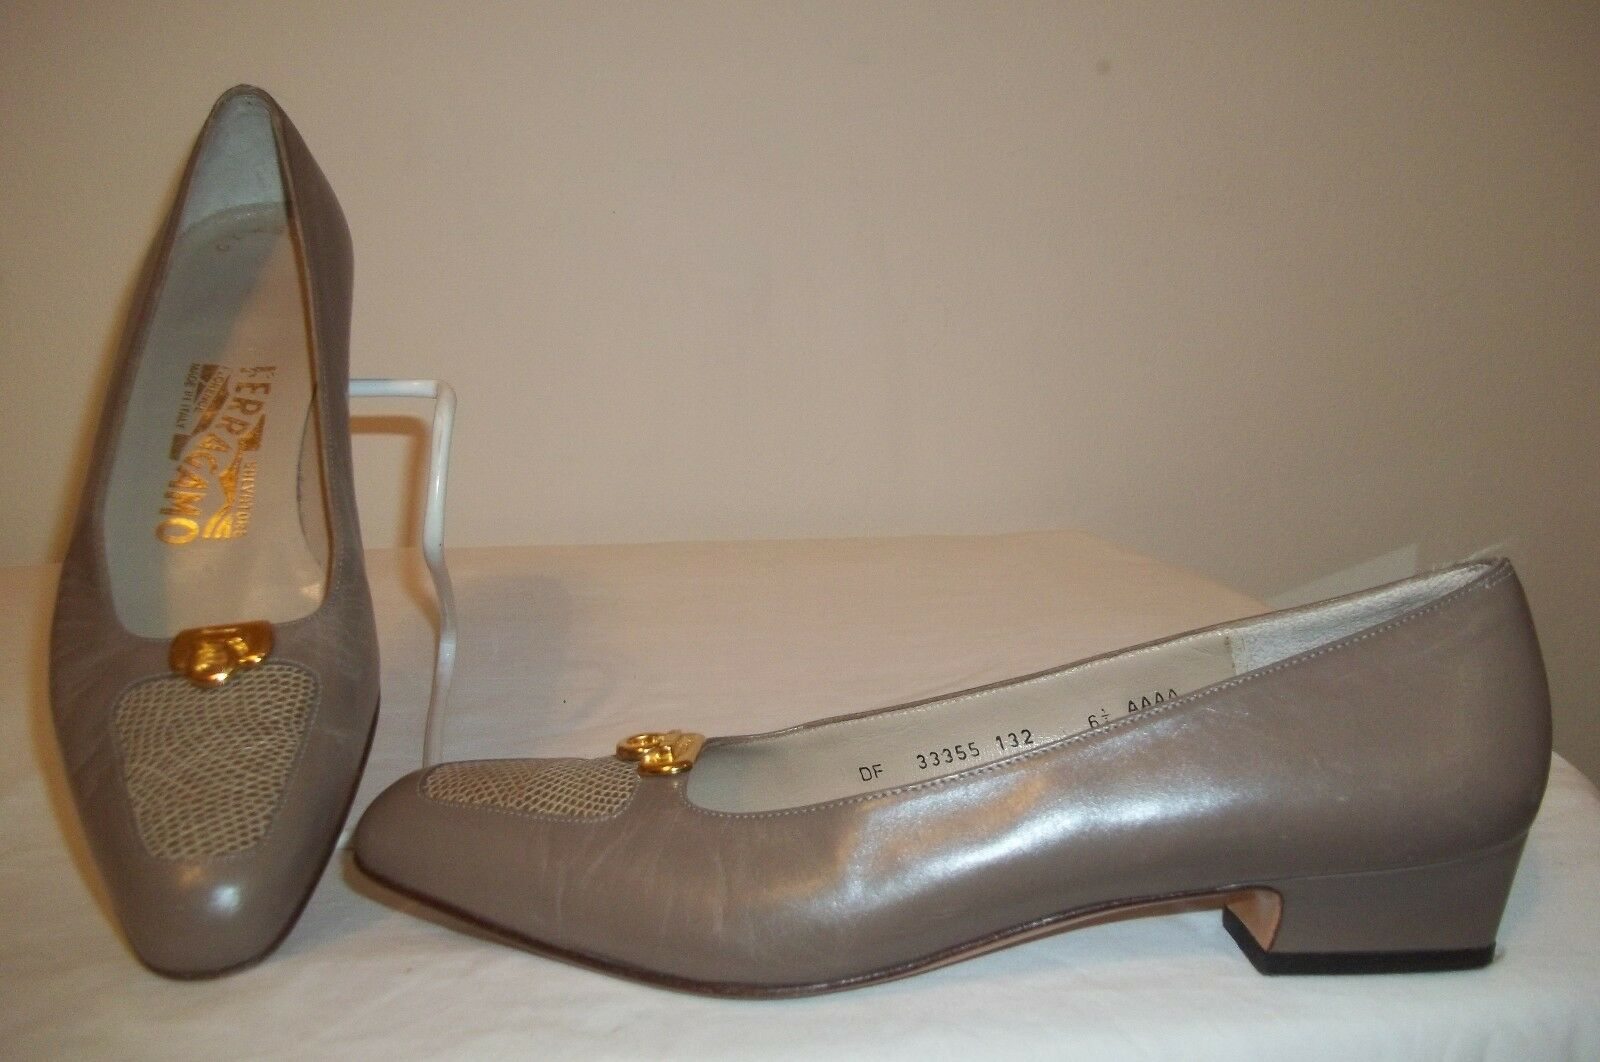 SALVATORE FERRAGAMO Taupe Leder Reptile Toe Gold Logo Low Heel Schuhes 6.5 AAAA